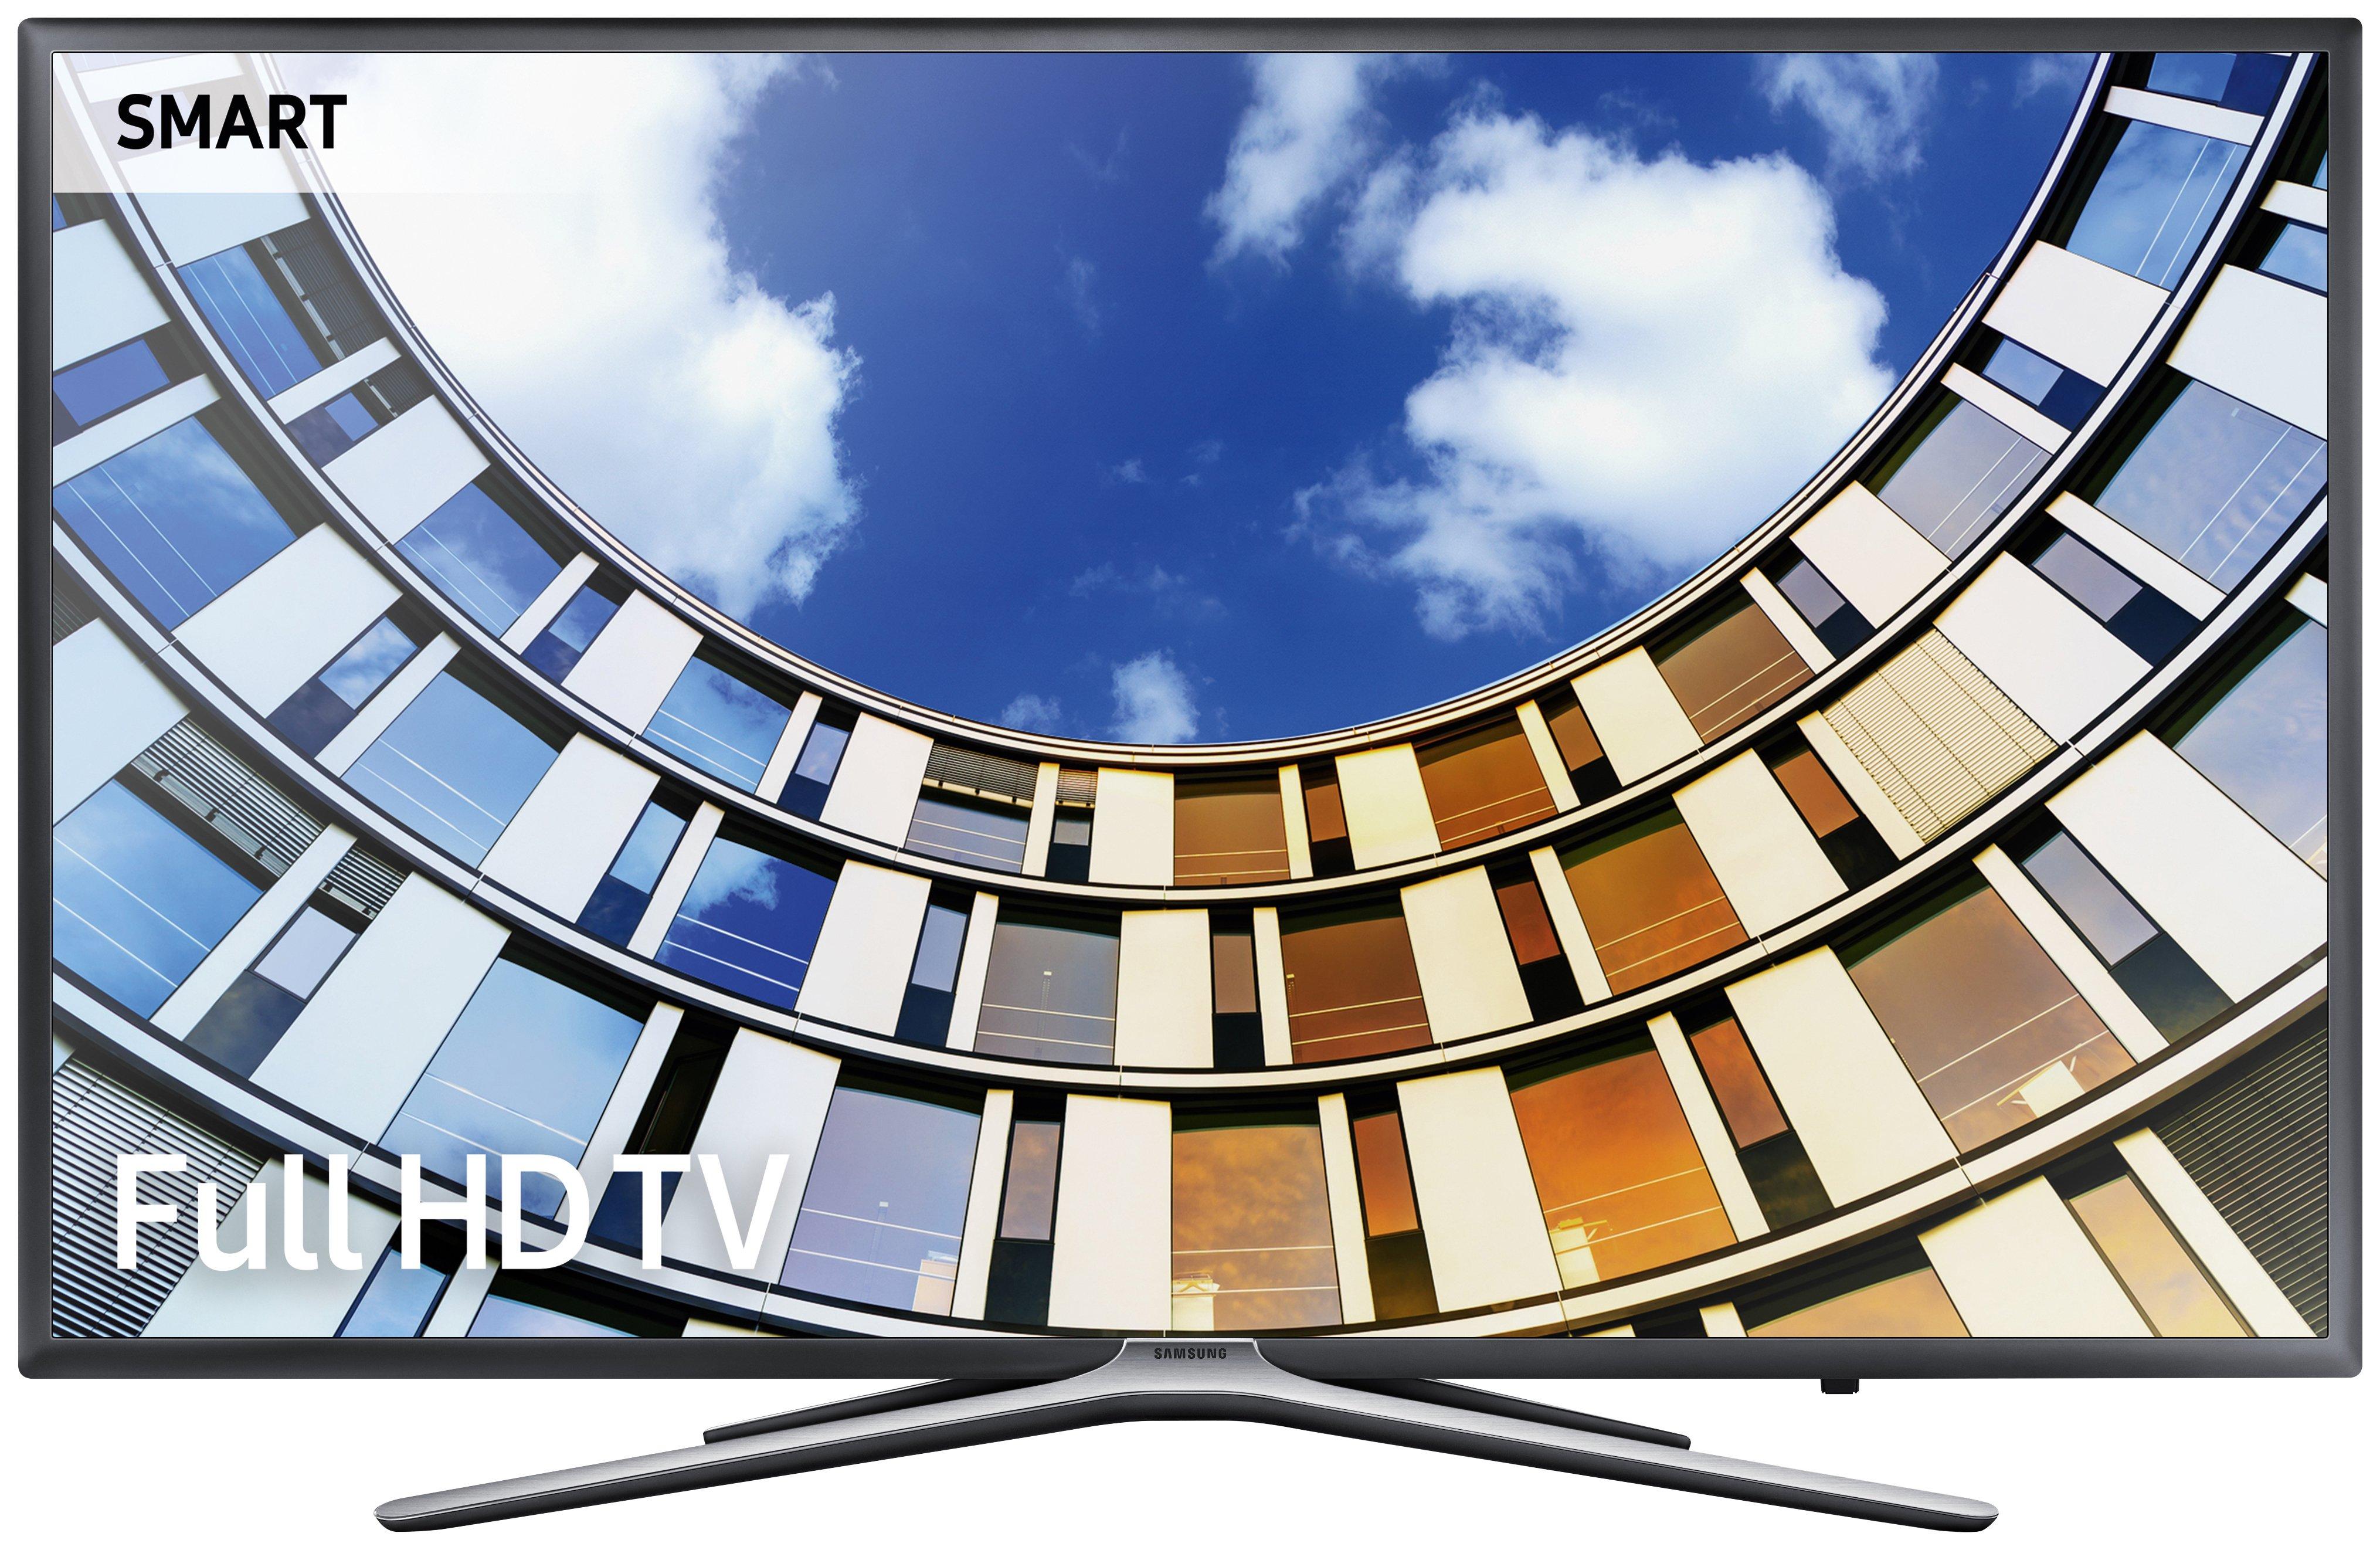 Samsung M5500 43 Inch Smart Full HD TV.